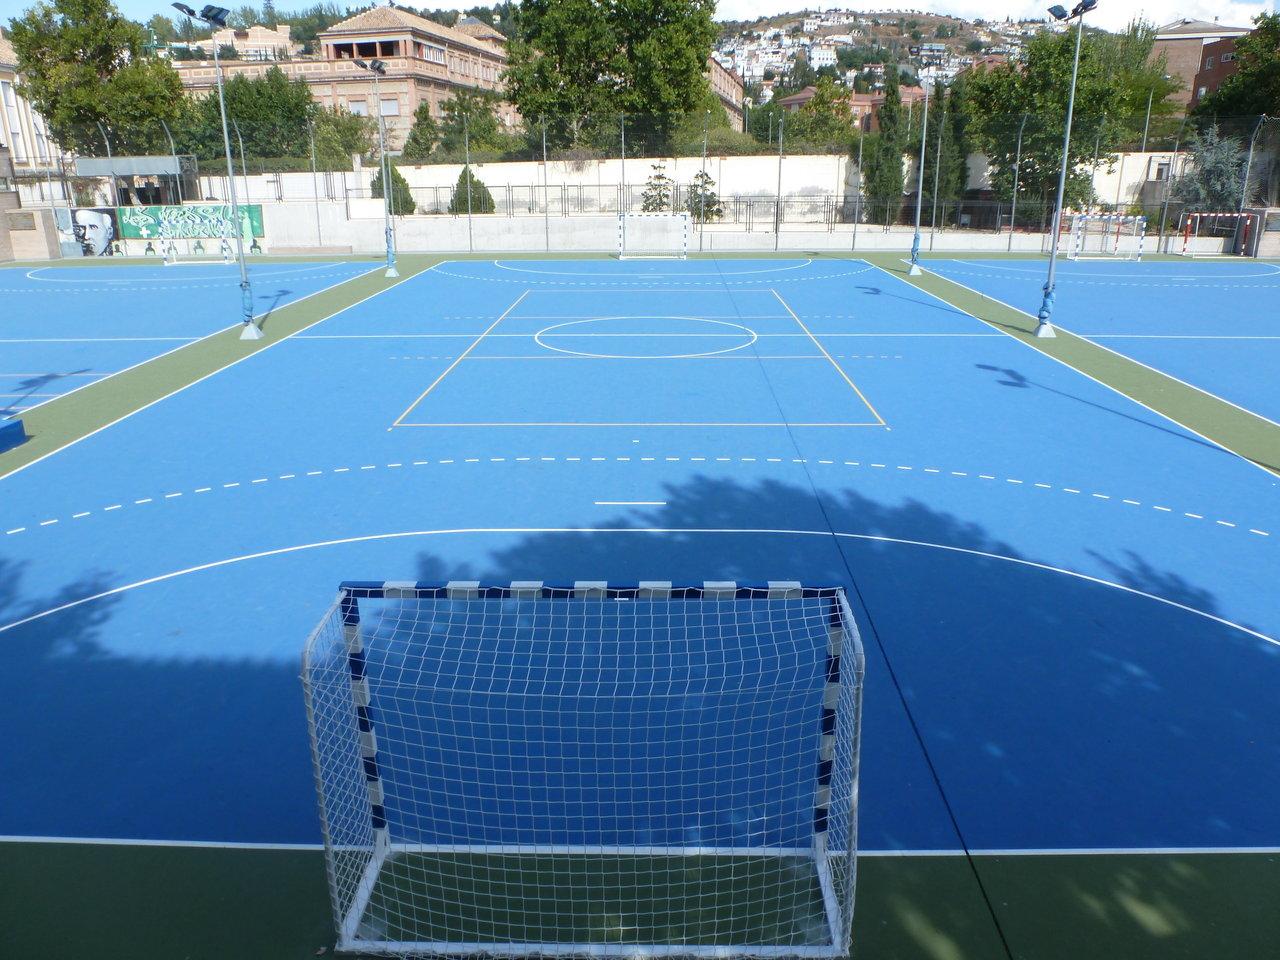 Pista exterior 2 polideportivo genil for Pista de futbol sala medidas